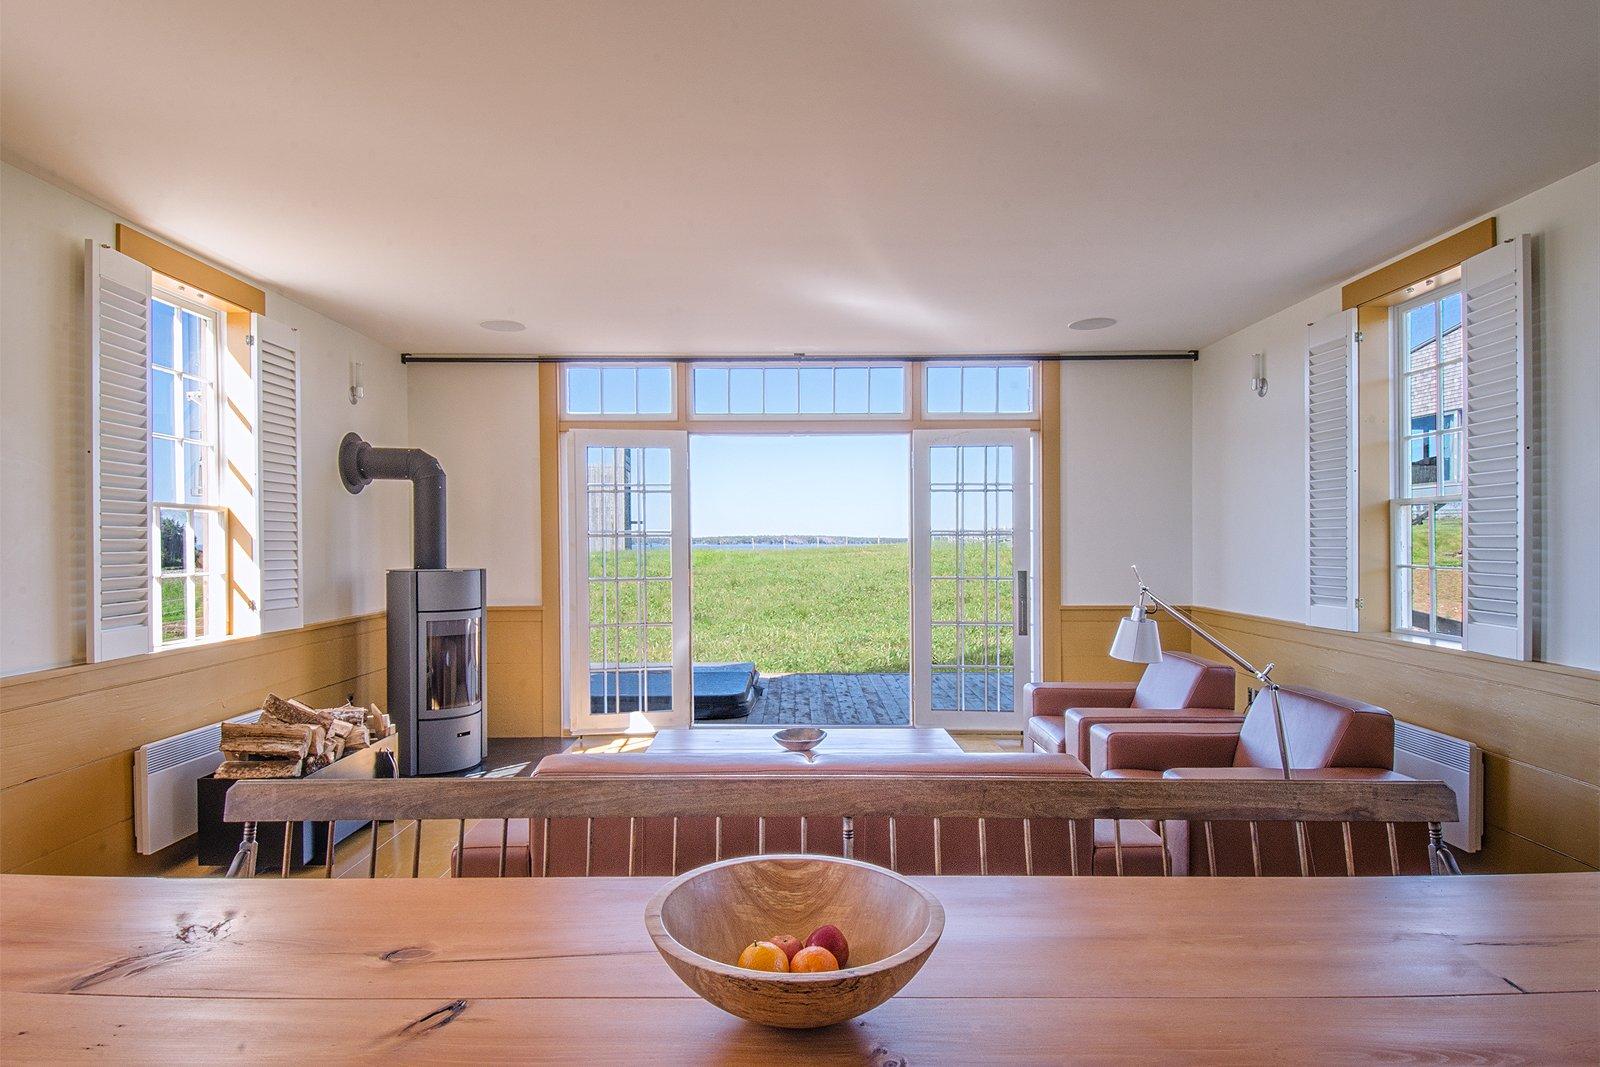 Living Room, Light Hardwood Floor, Sofa, Corner Fireplace, Wood Burning Fireplace, and Recessed Lighting  Schoolhouse